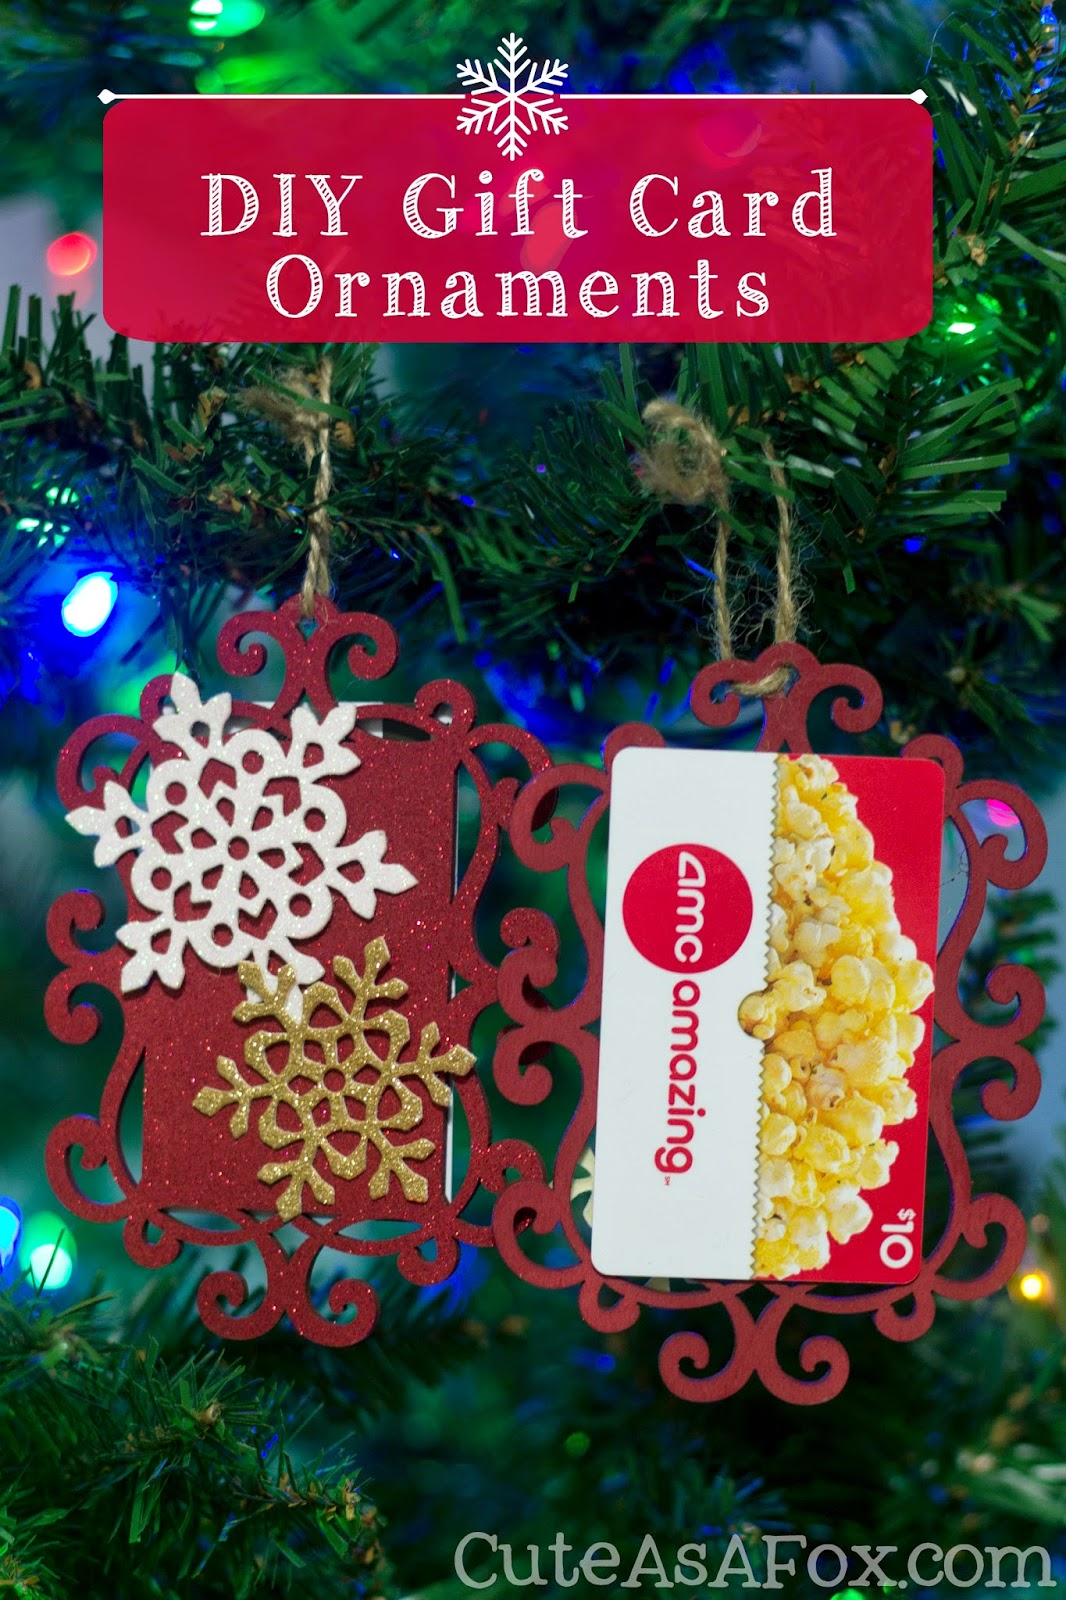 http://3.bp.blogspot.com/-j-RVn_dIoYg/VIkVh1s424I/AAAAAAAAN8k/nMK71-J04xE/s1600/Snowflake-Gift-Card-Ornaments-Front-Back-Title-wm.jpg